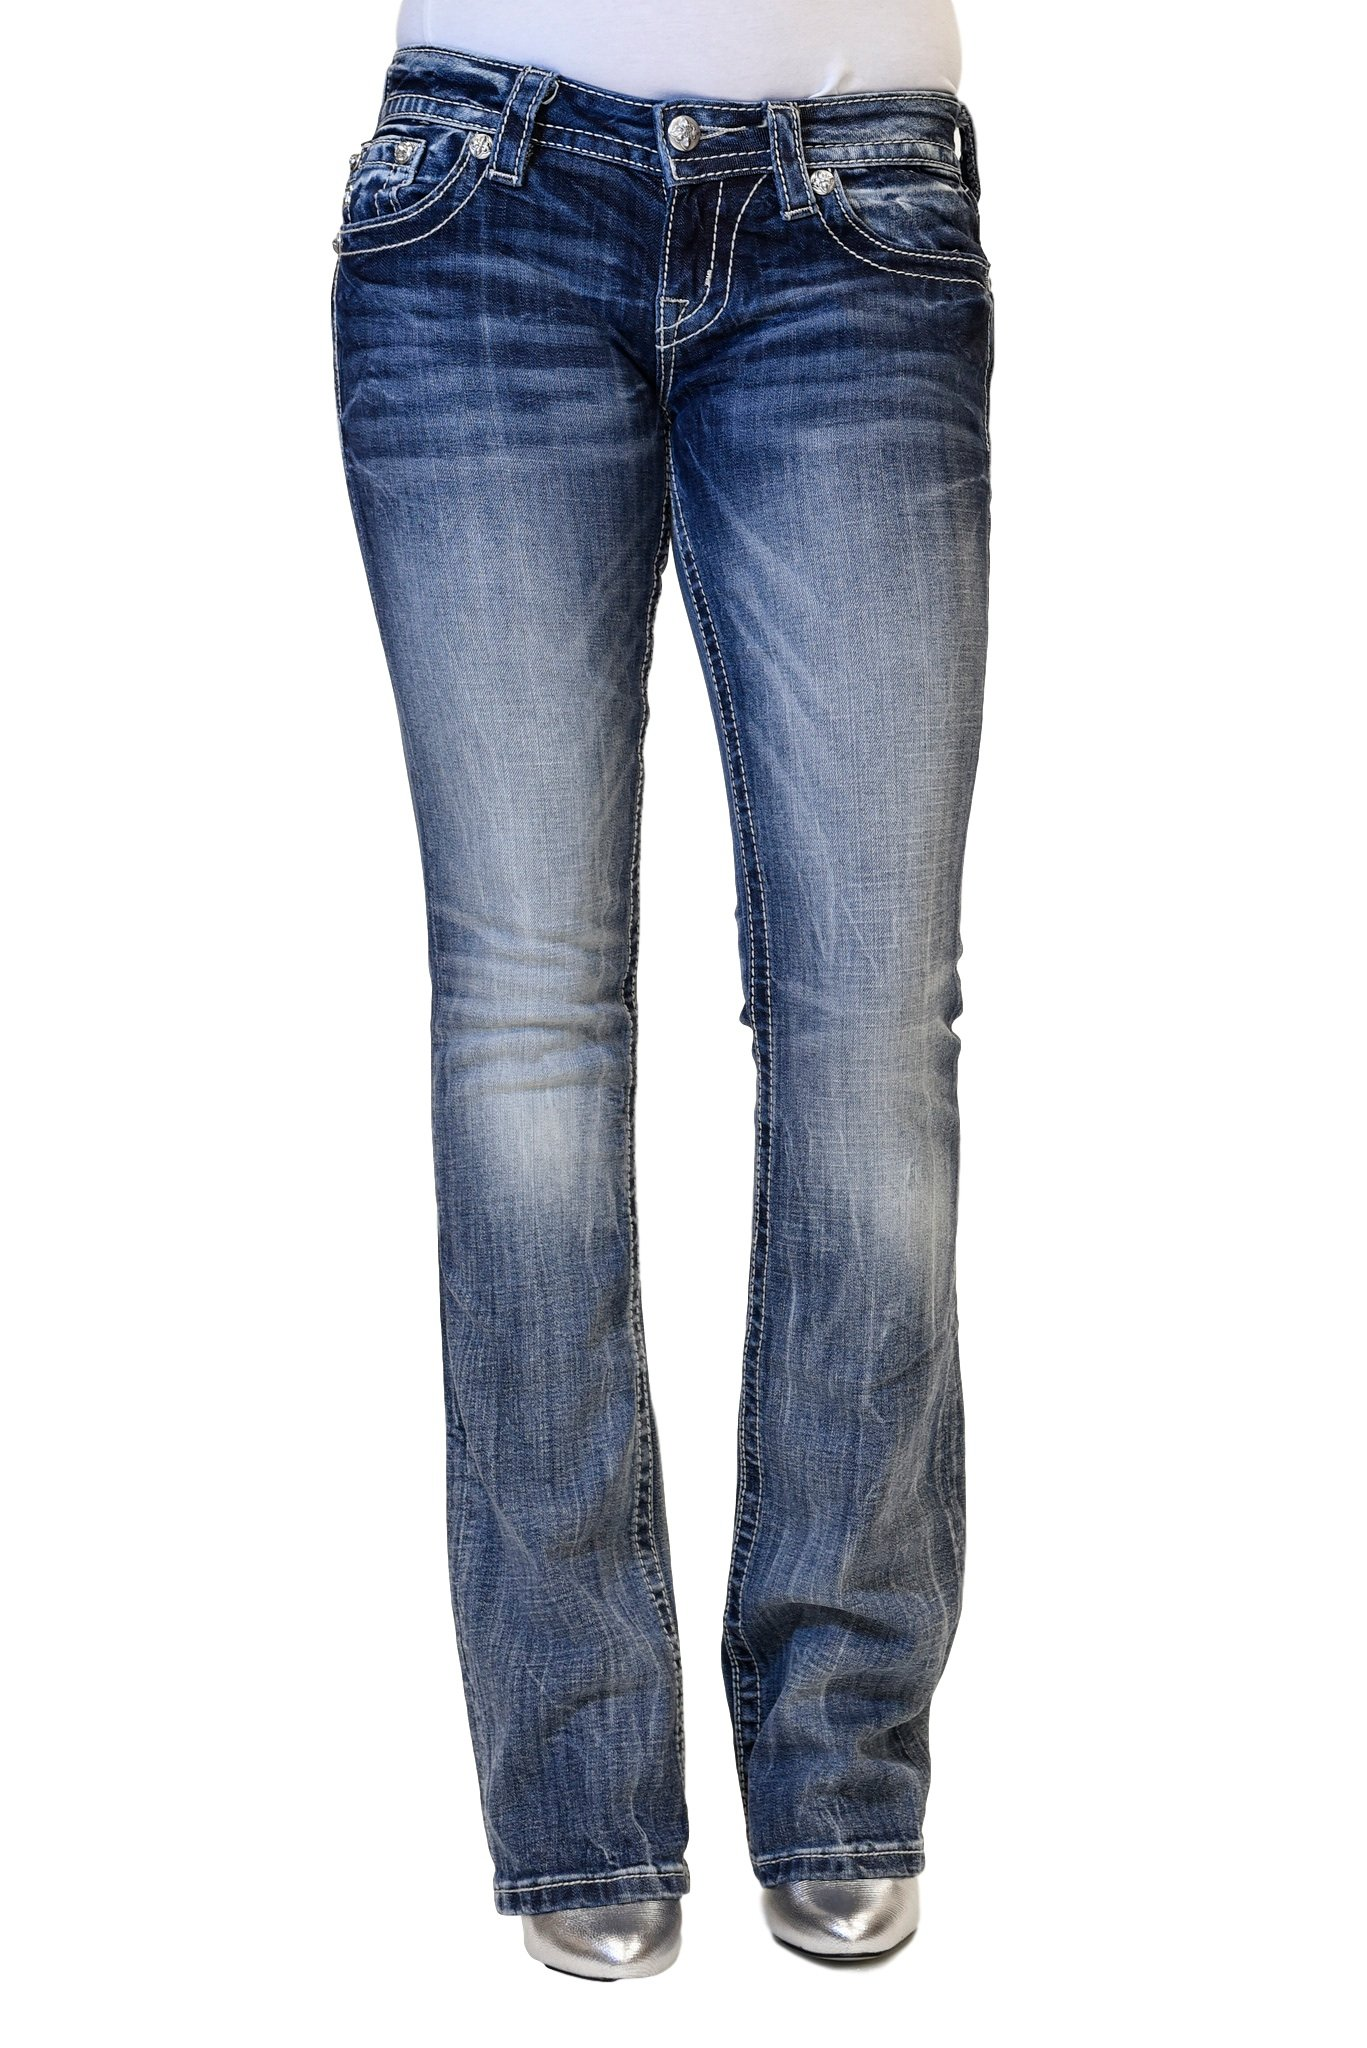 Miss Me Jeans Women's Medium Wash Totem Pol Angel Wings Cross Slim Boot Cut (26)